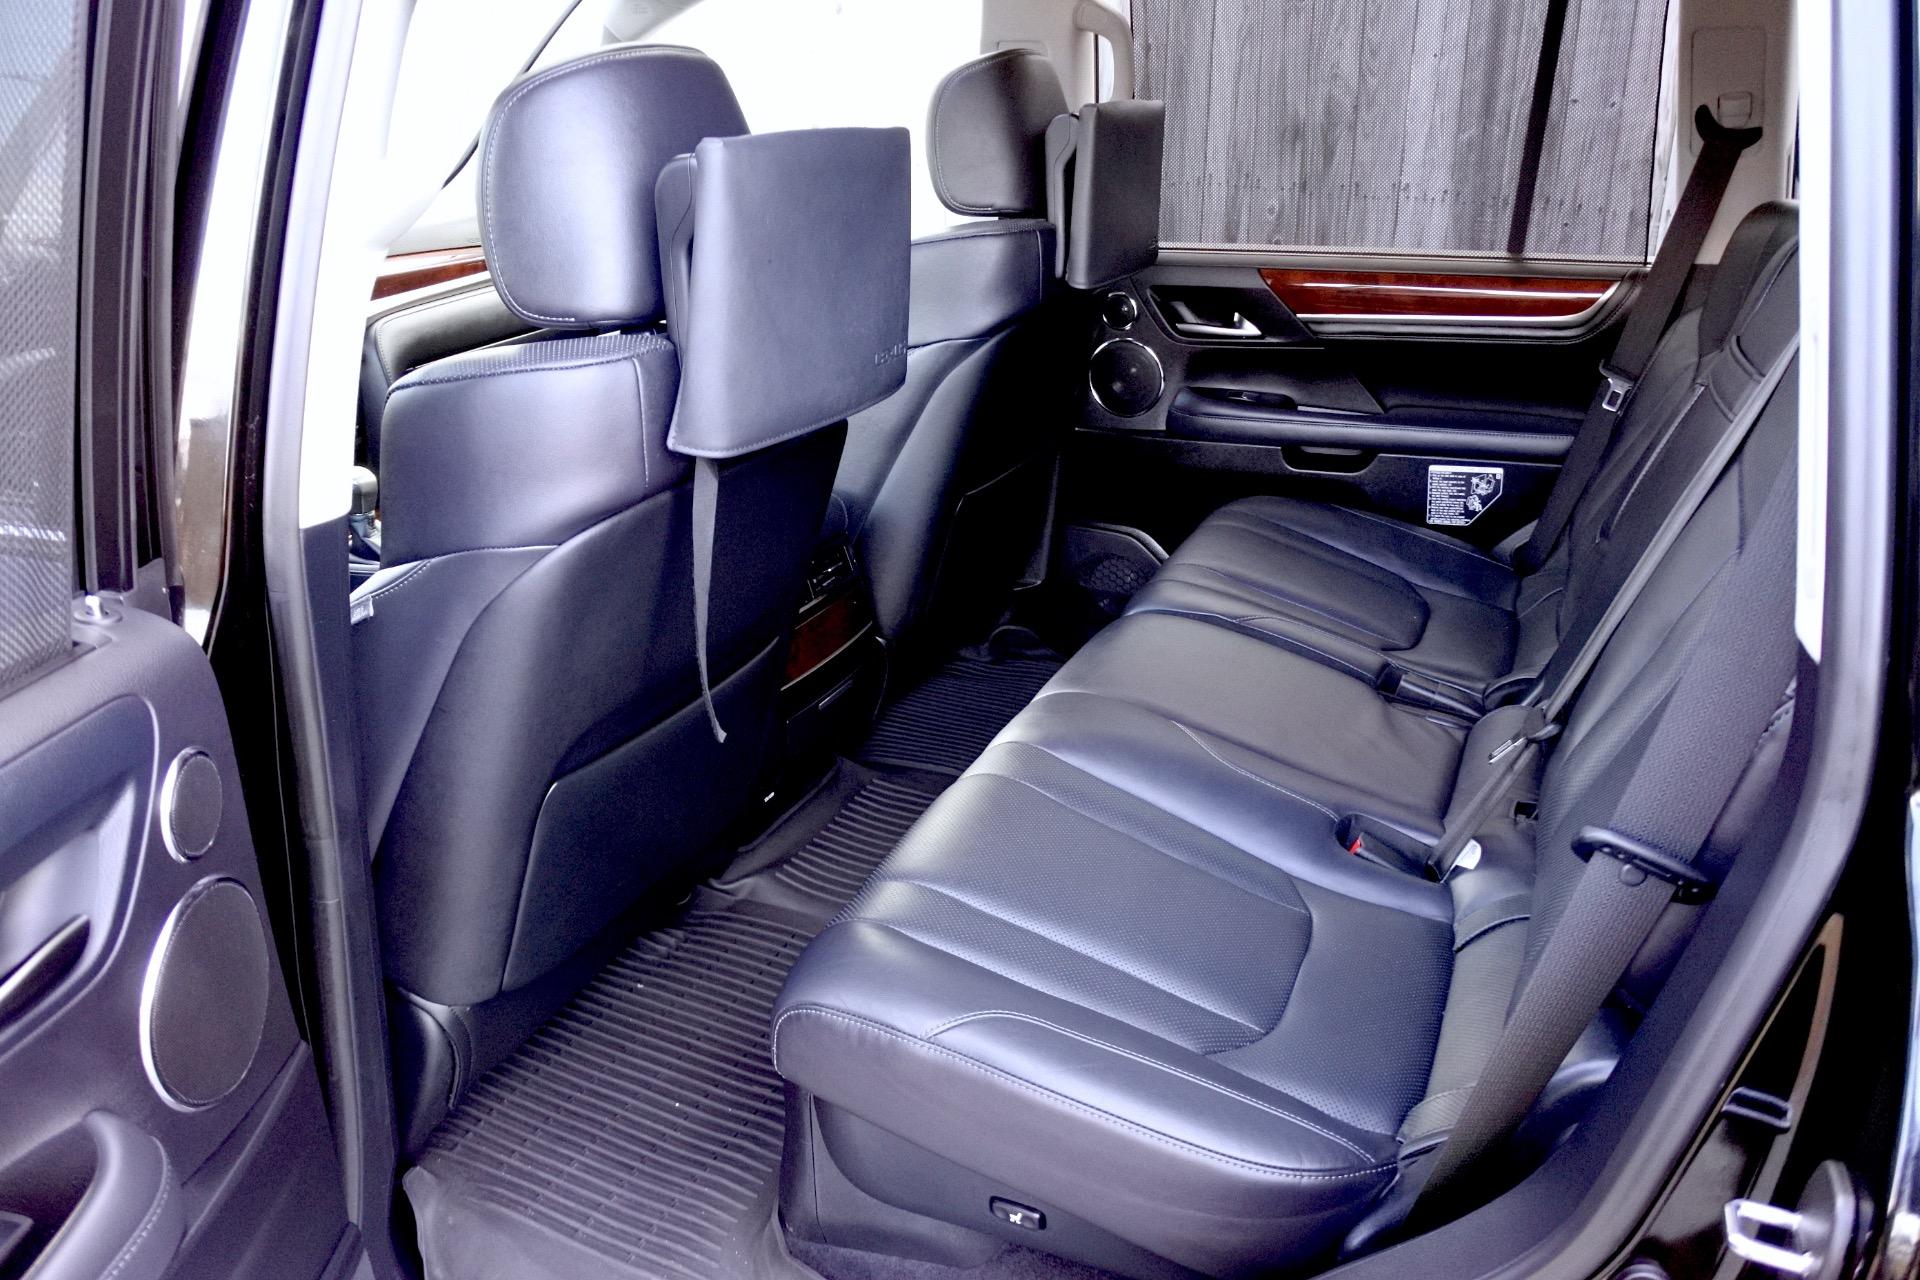 Used 2017 Lexus Lx LX 570 4WD Used 2017 Lexus Lx LX 570 4WD for sale  at Metro West Motorcars LLC in Shrewsbury MA 15